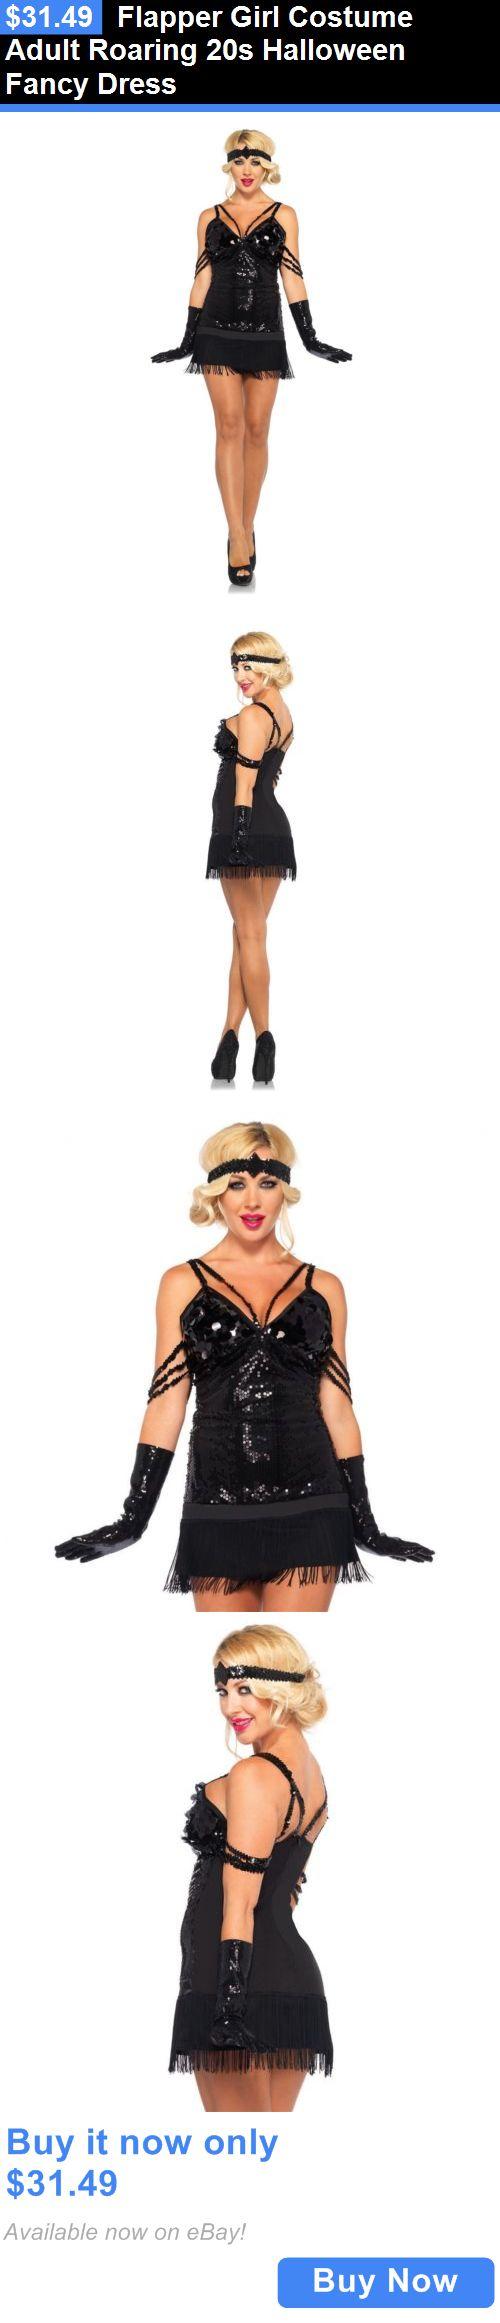 Halloween Costumes: Flapper Girl Costume Adult Roaring 20S Halloween Fancy Dress BUY IT NOW ONLY: $31.49